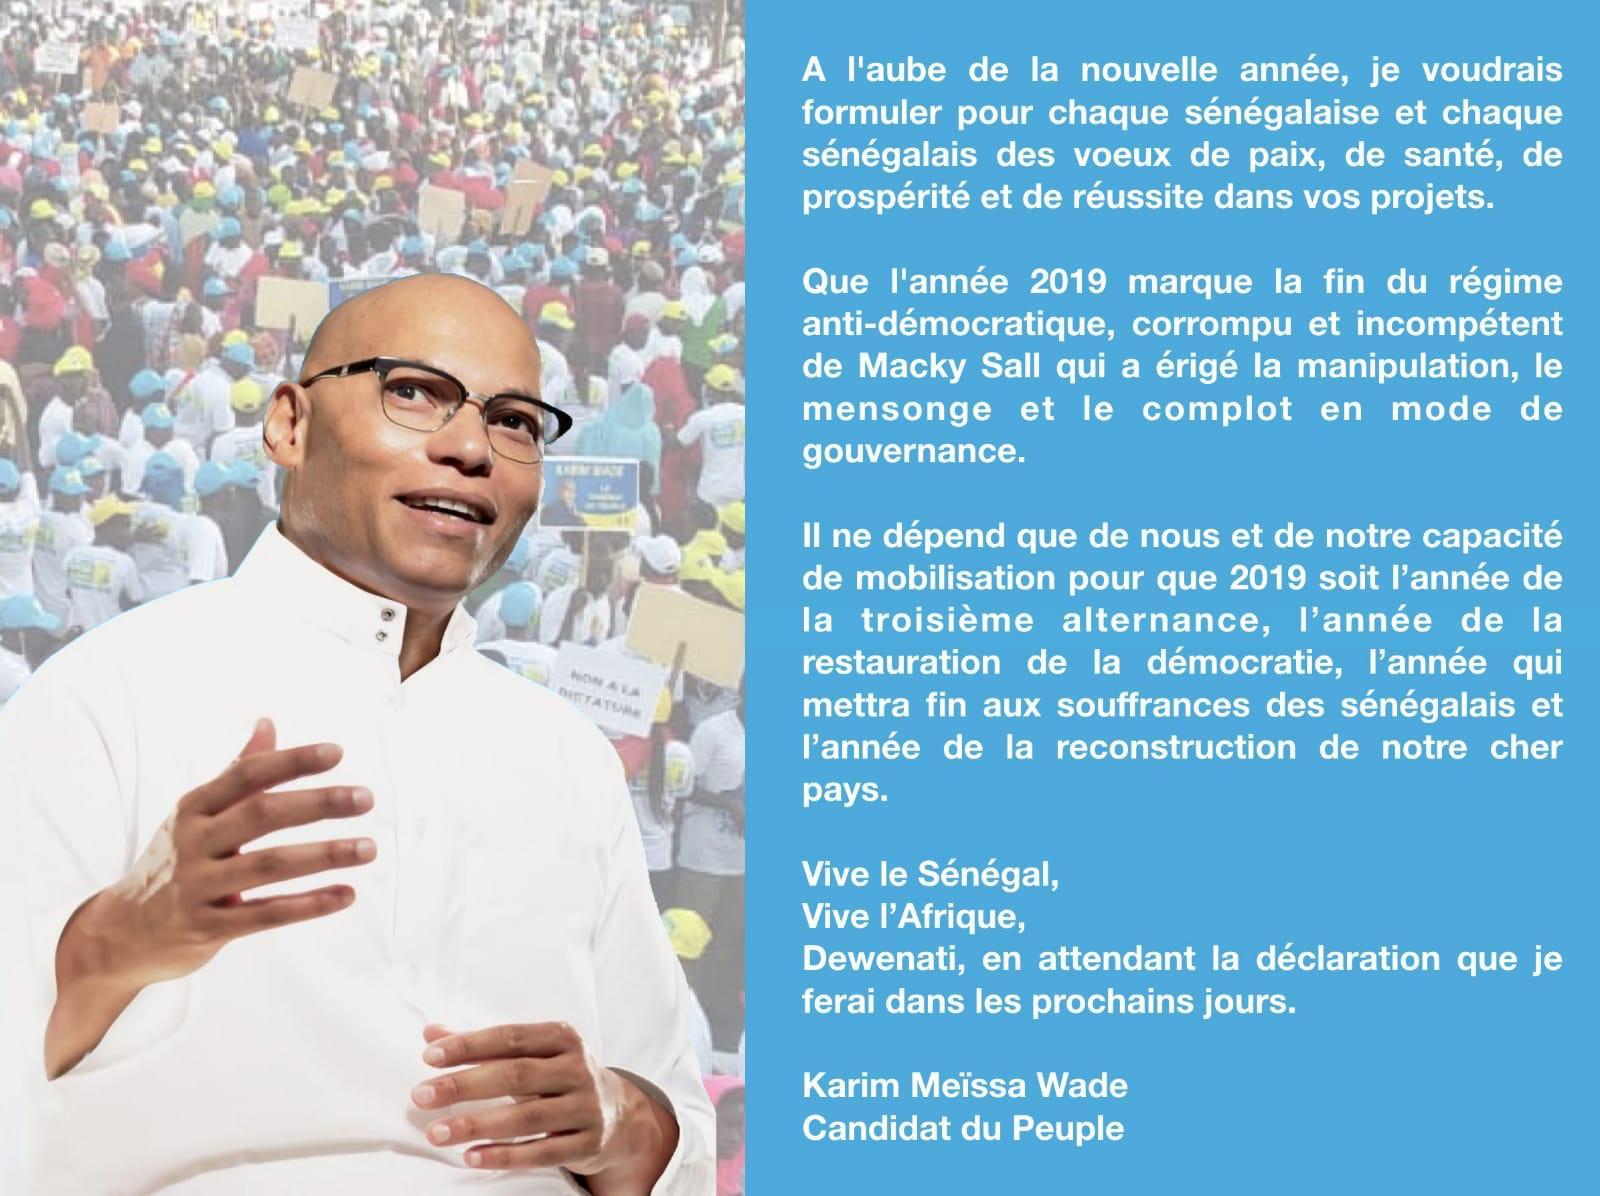 Message de Karim Wade à la Nation : «Que 2019 marque la fin du régime corrompu de Macky Sall»